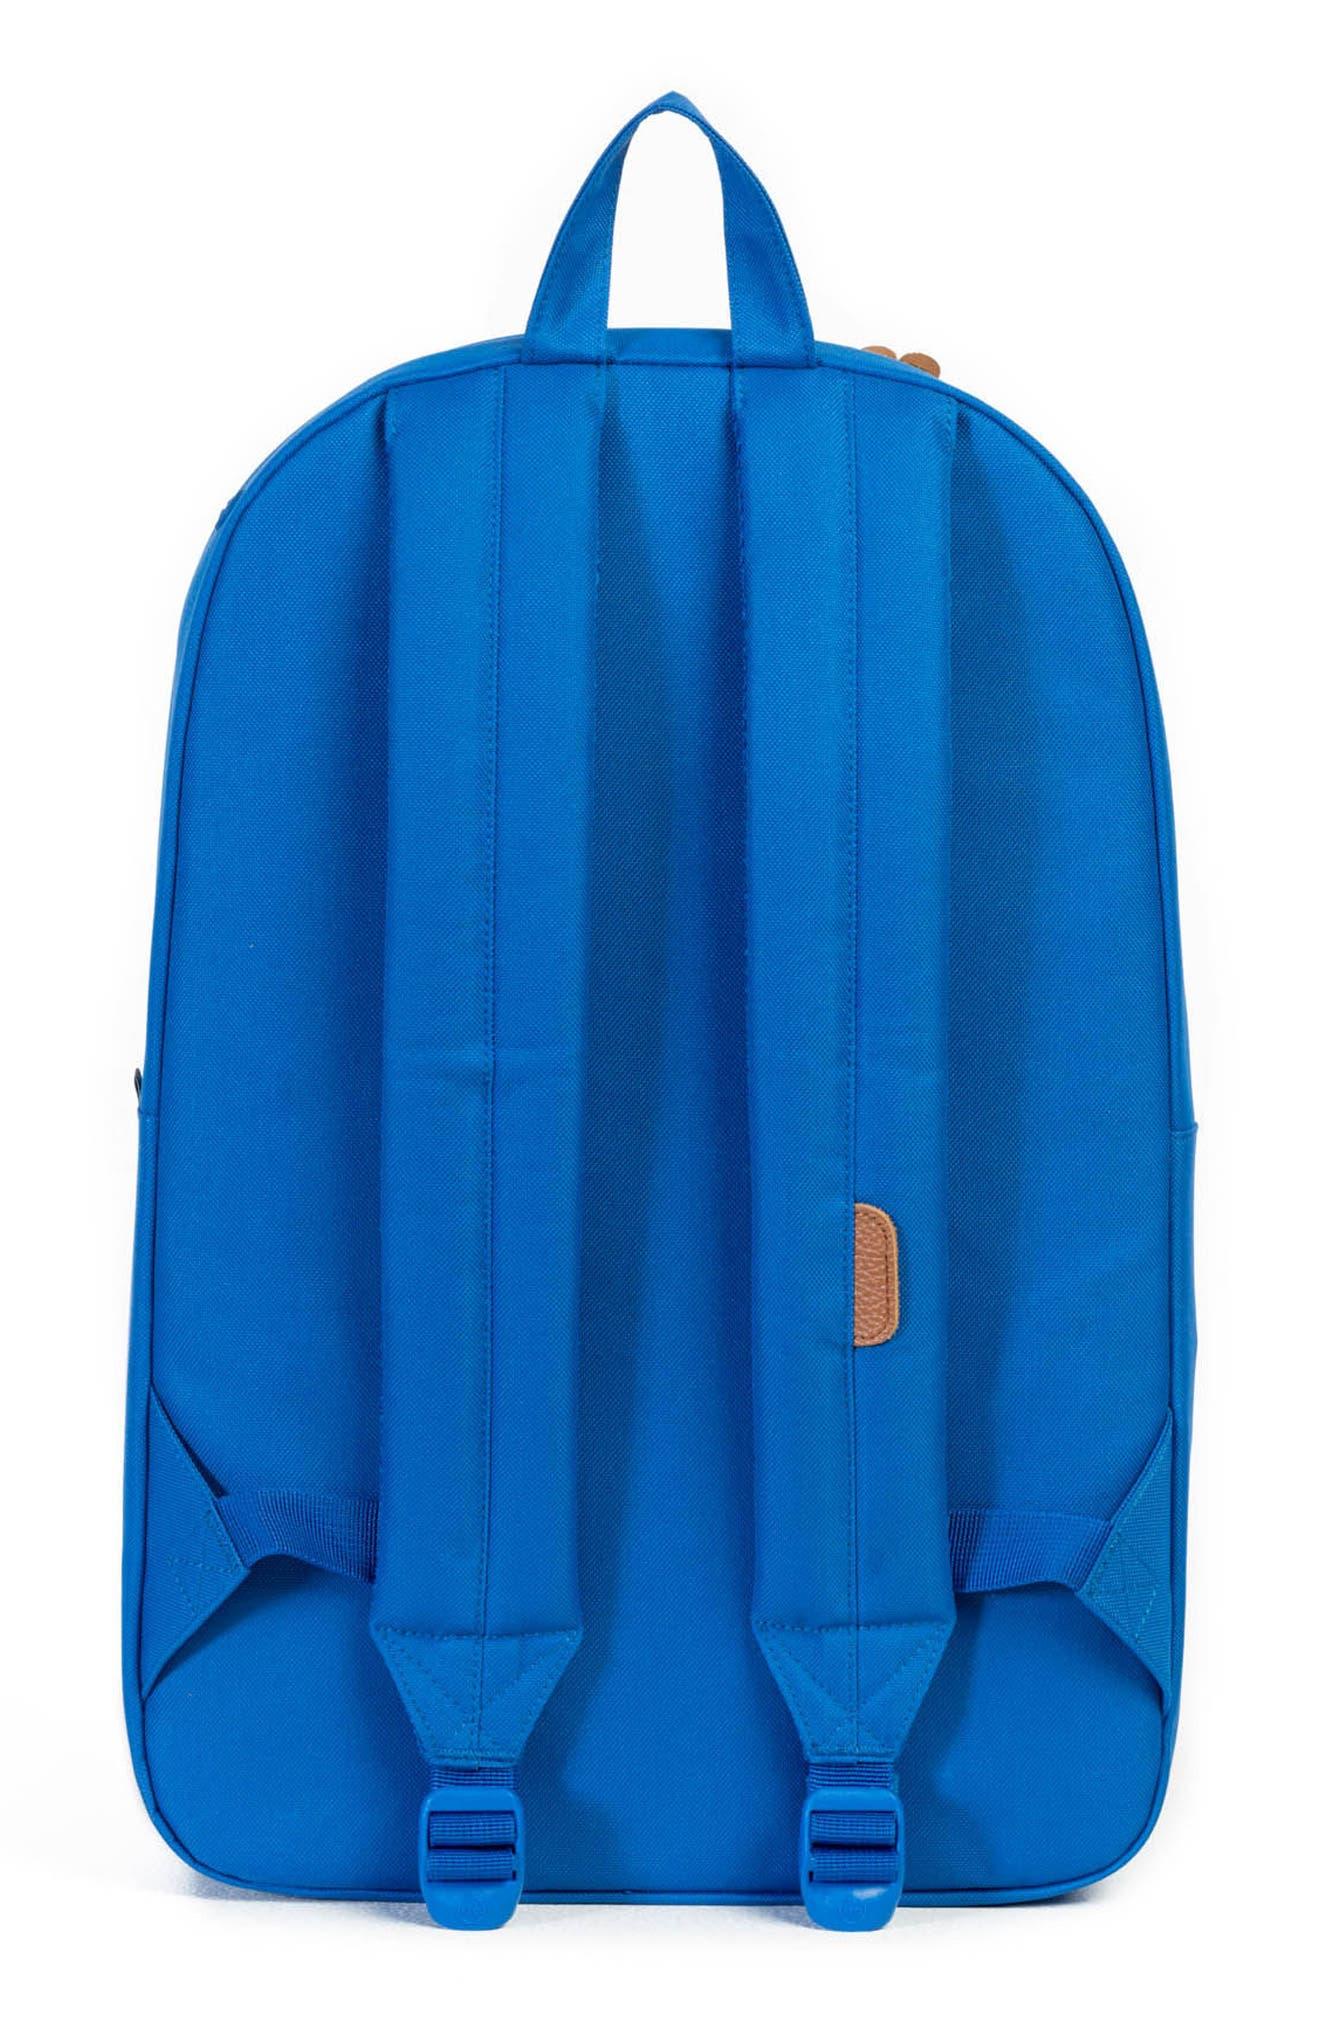 Heritage Toronto Blue Jays Backpack,                             Alternate thumbnail 2, color,                             Toronto Blue Jays